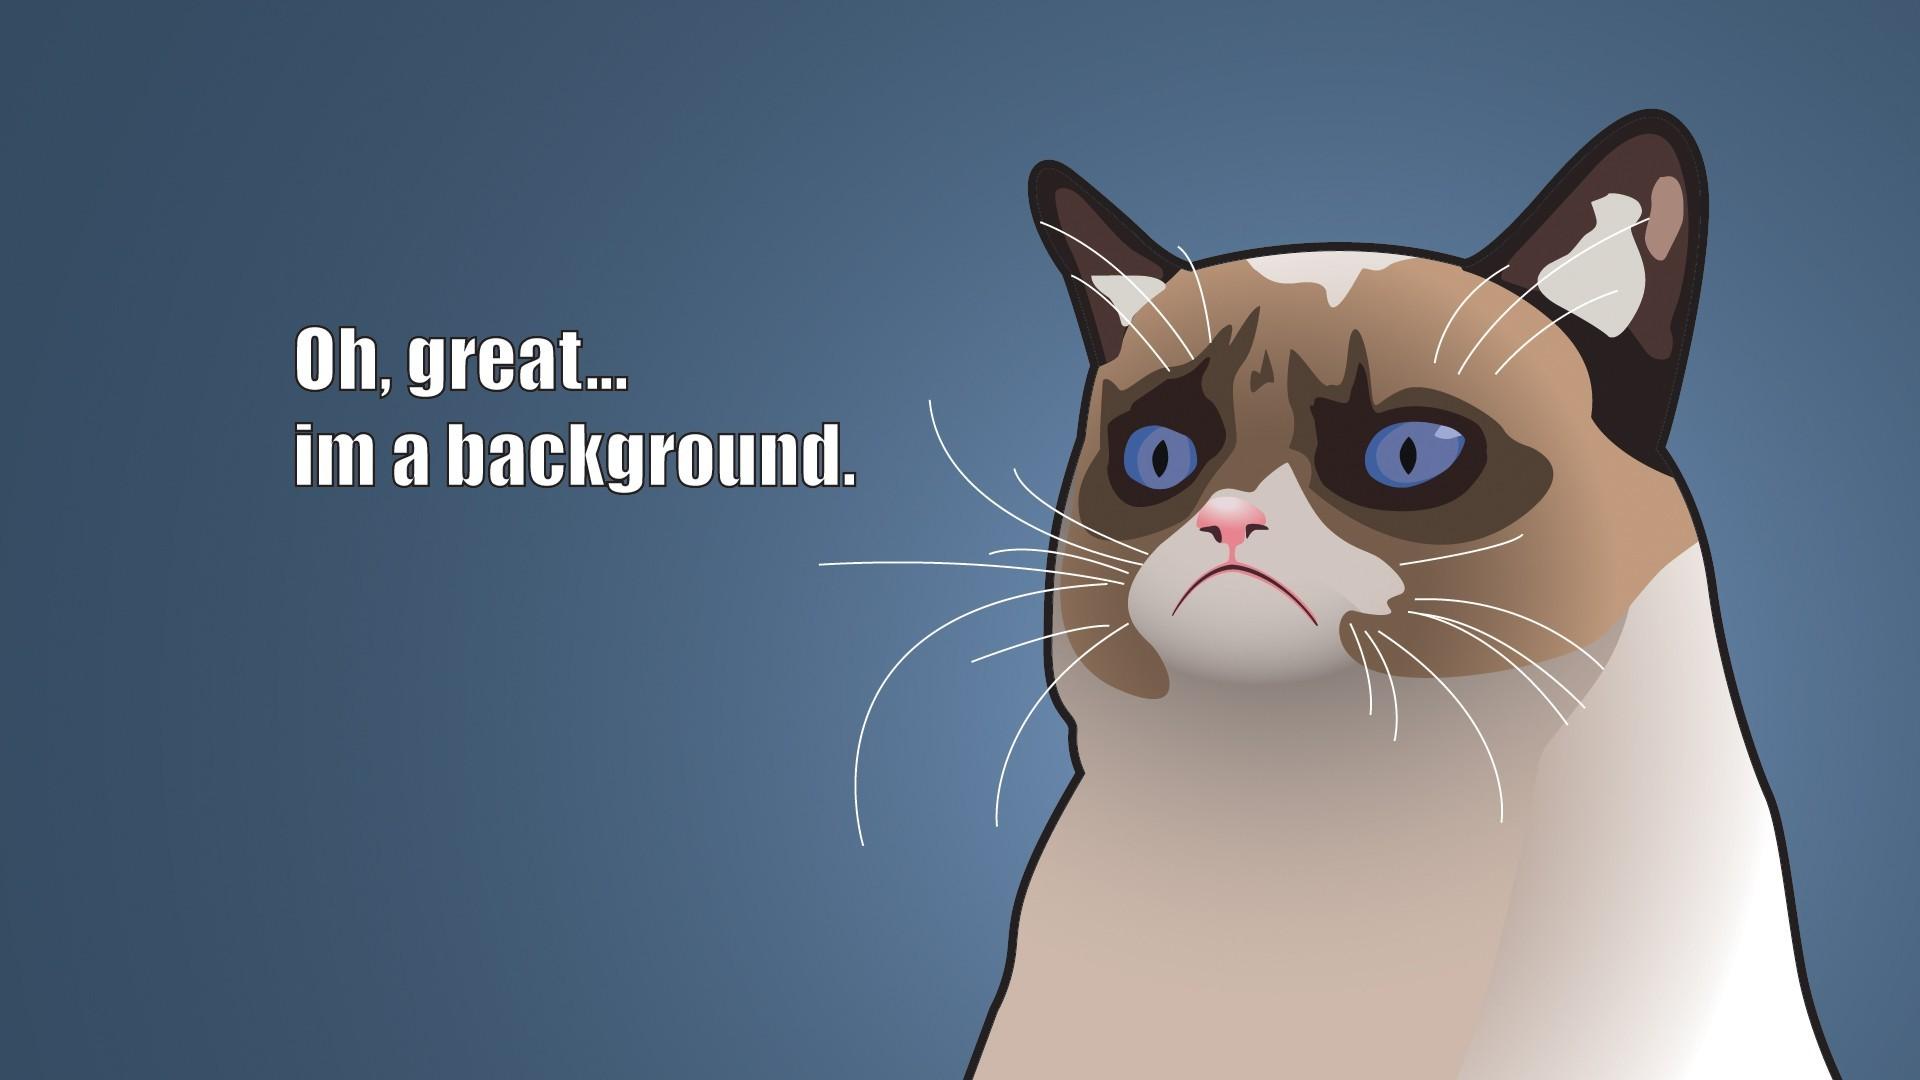 8k Animal Wallpaper Download: Cartoon Wallpapers, Photos And Desktop Backgrounds Up To